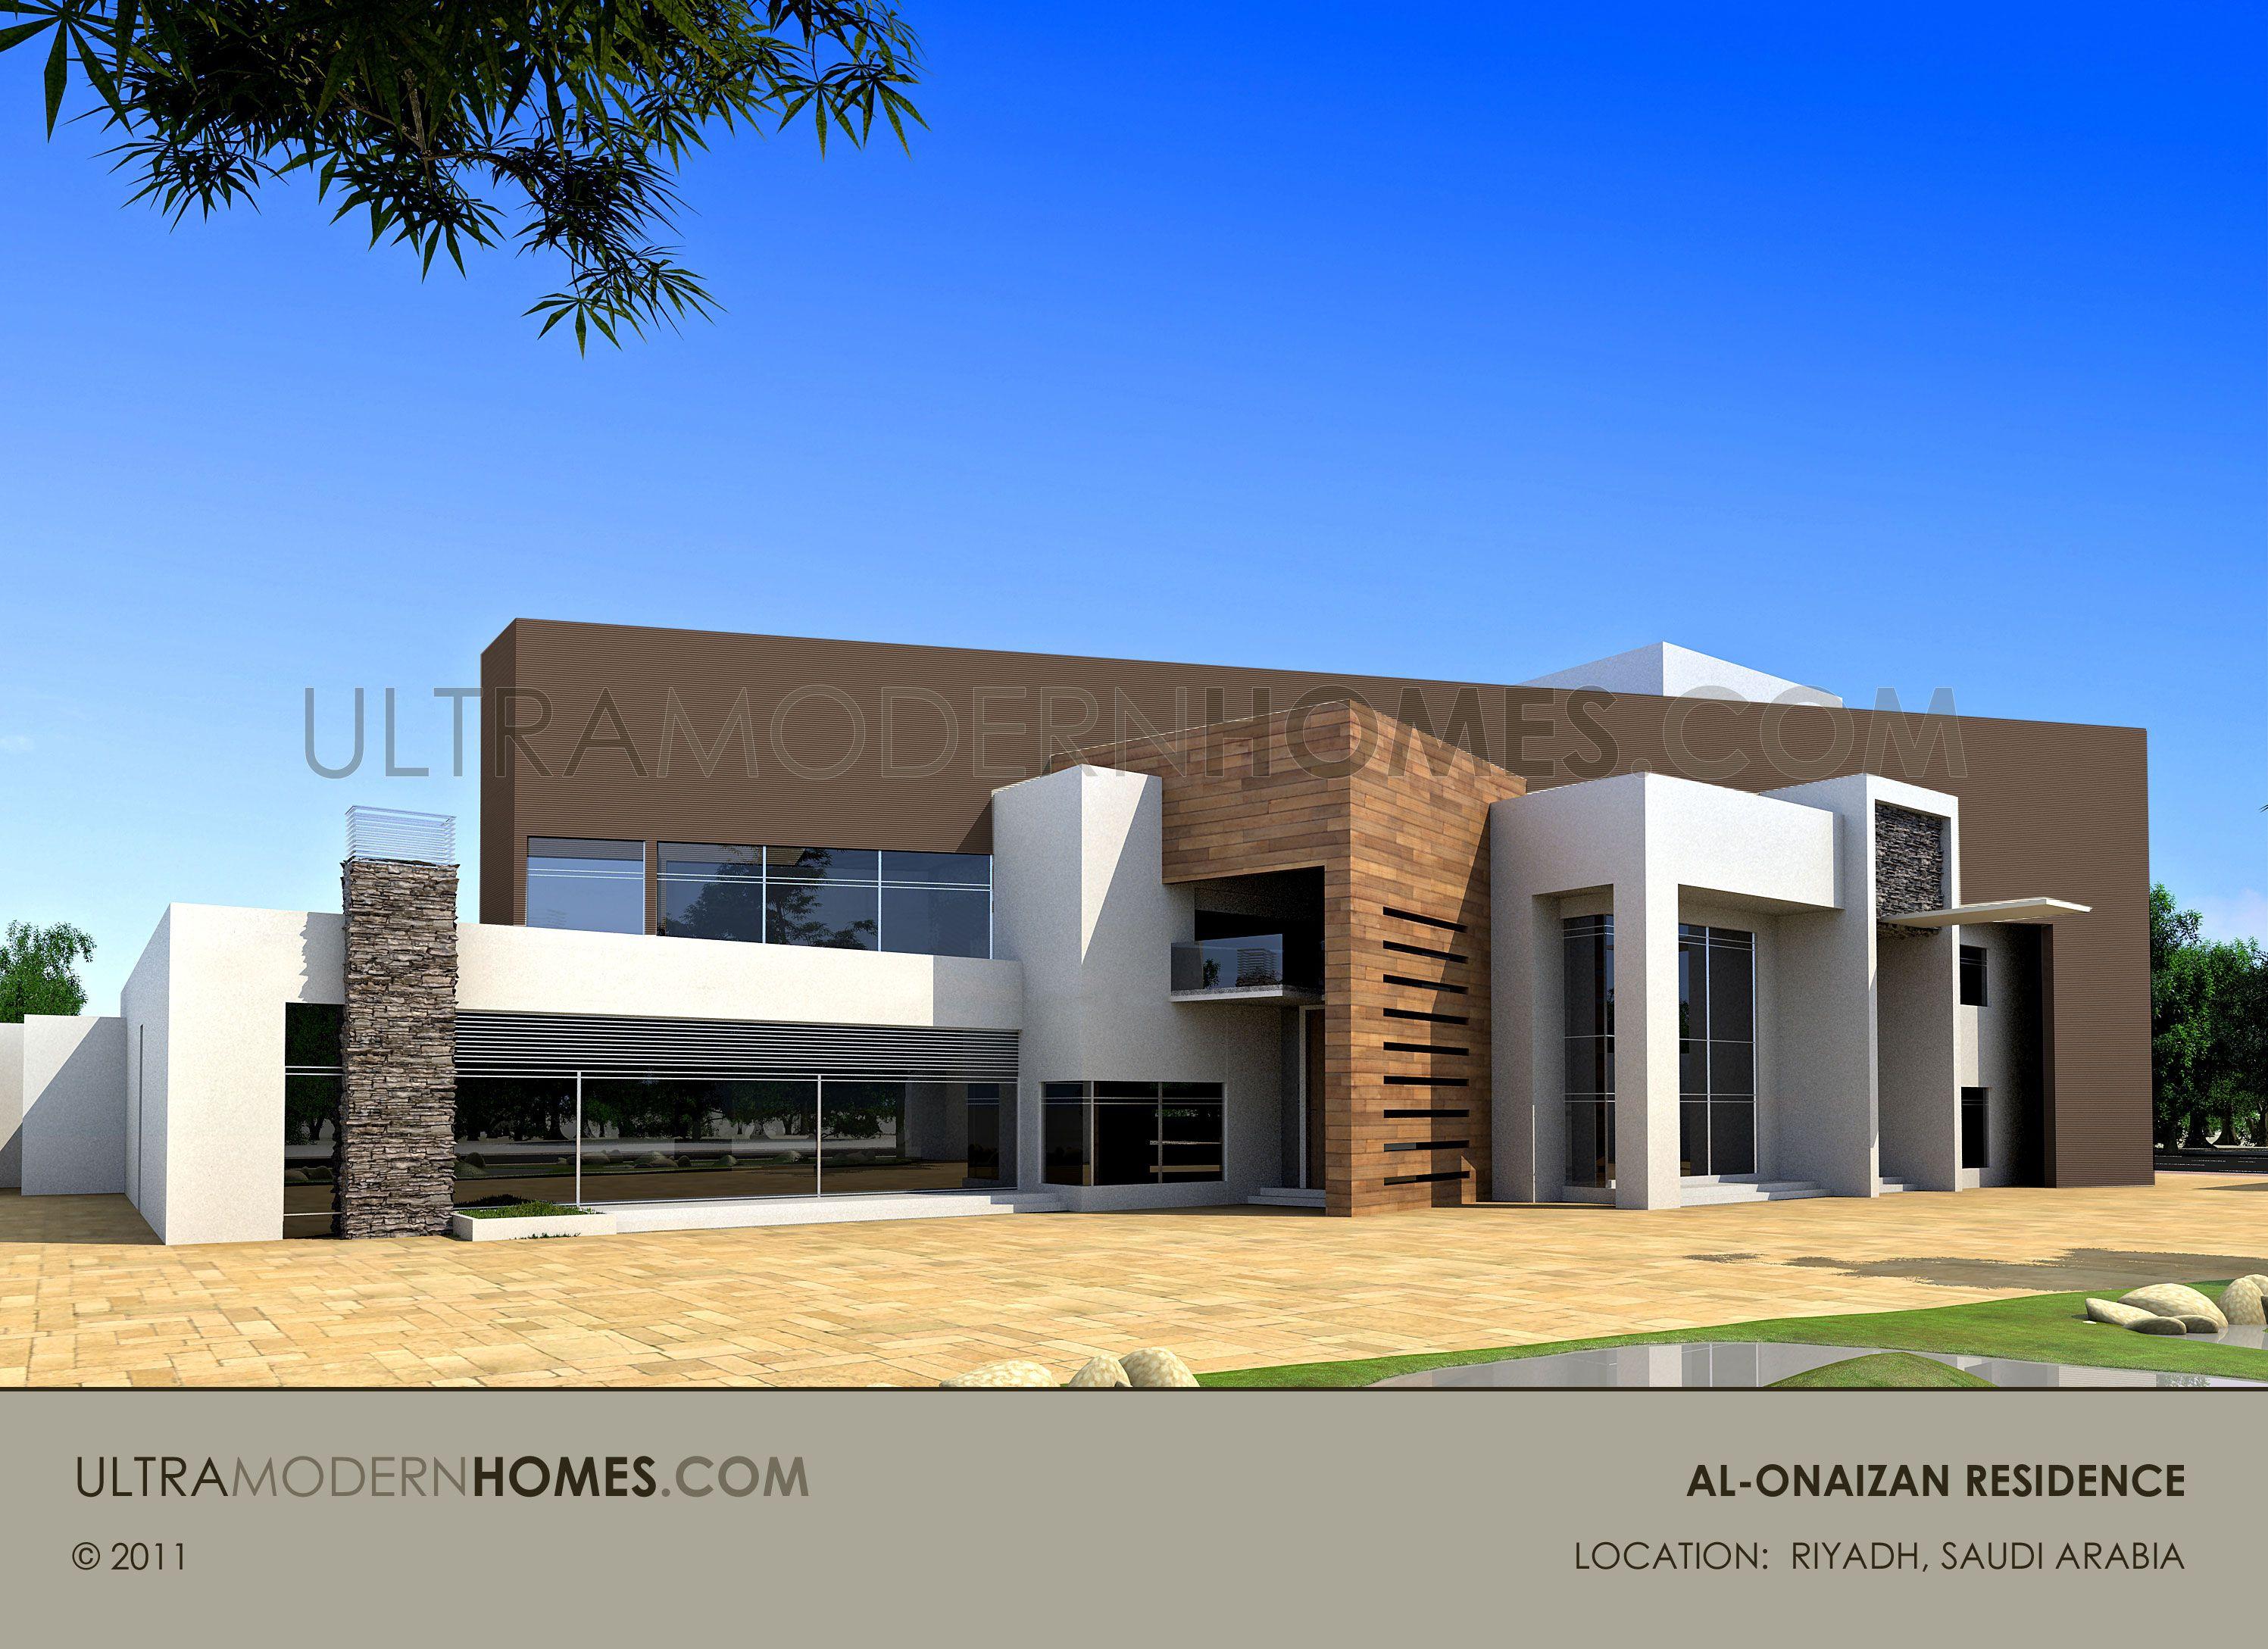 Luxury Ultra Modern Custom Home Design In Riyadh Saudi Arabia